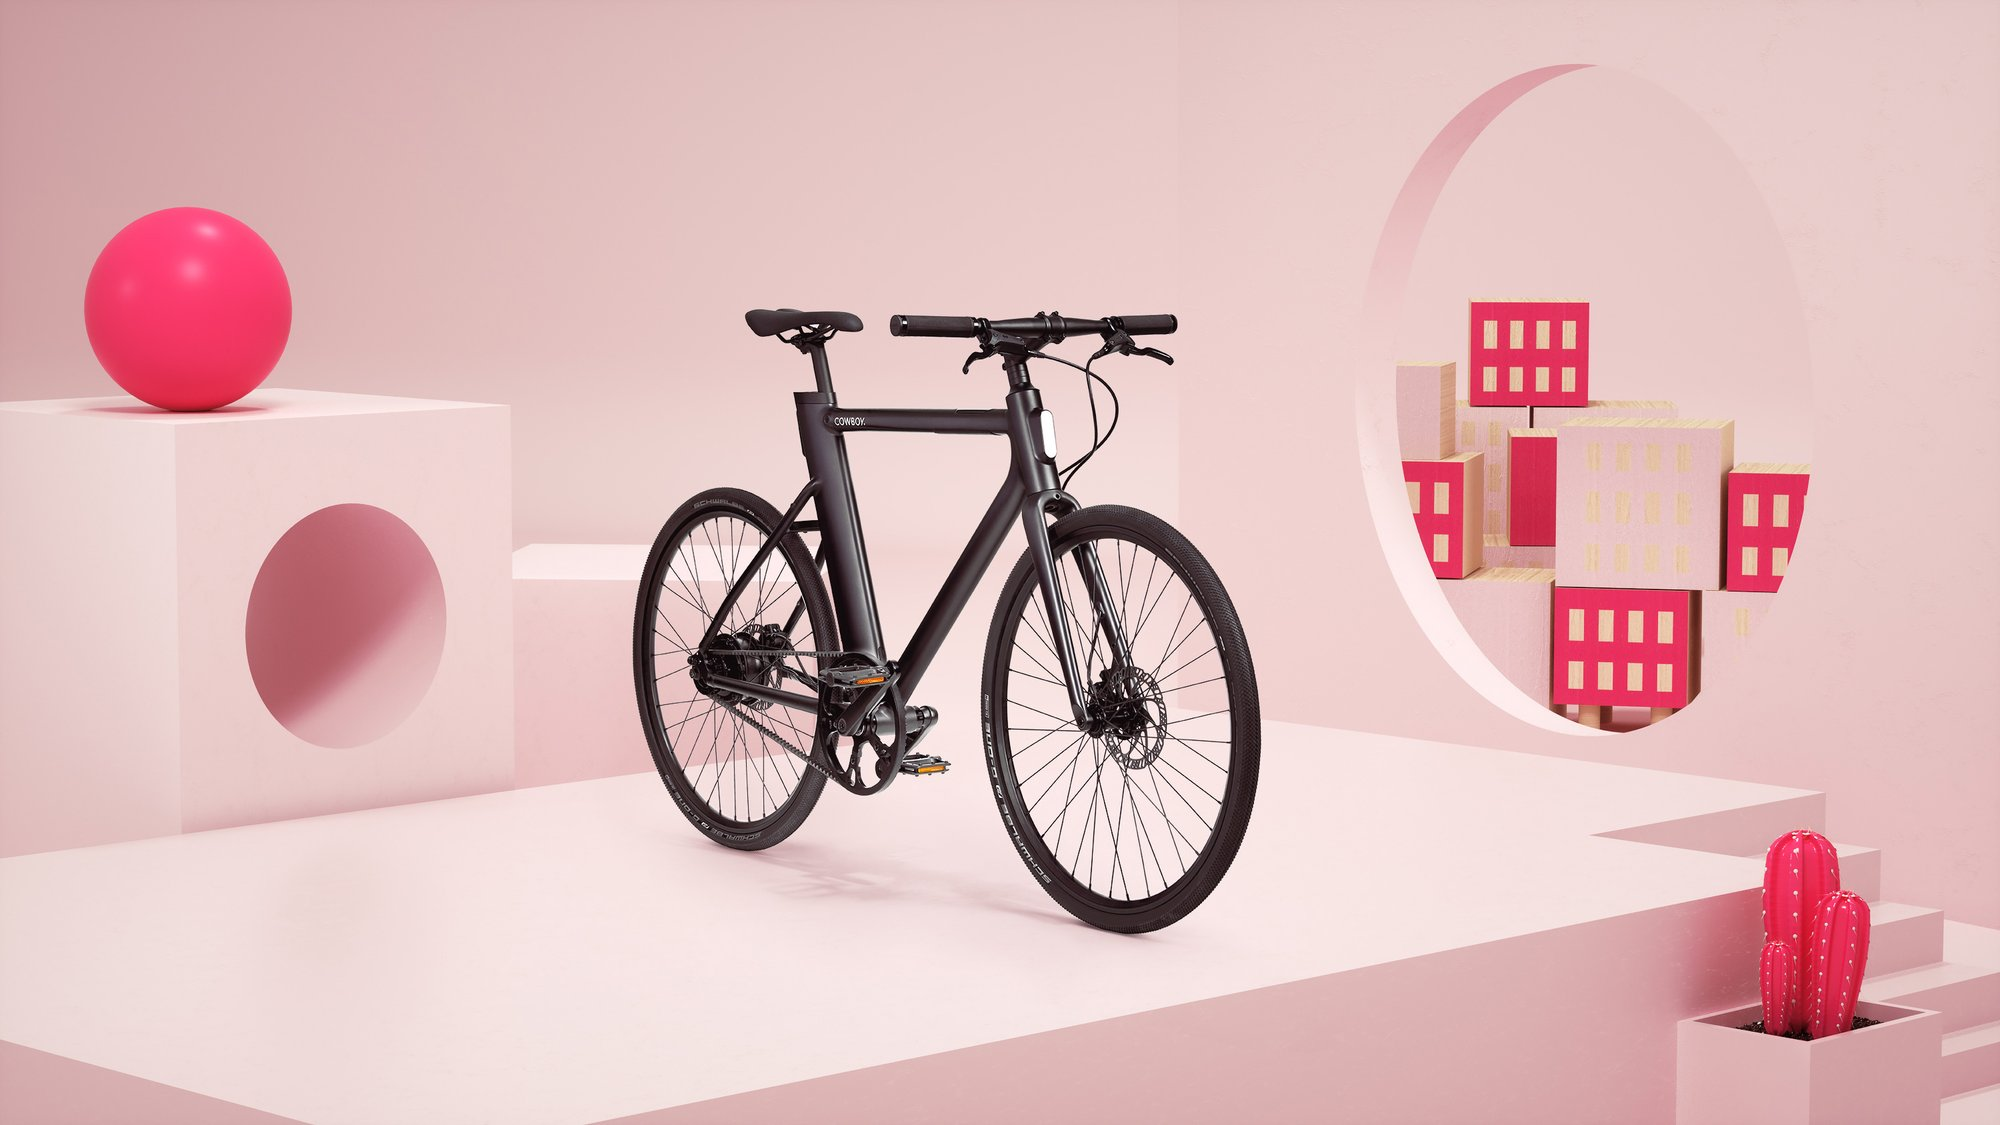 Cowboy E-Bike: Fahrrad fahren mit Stil